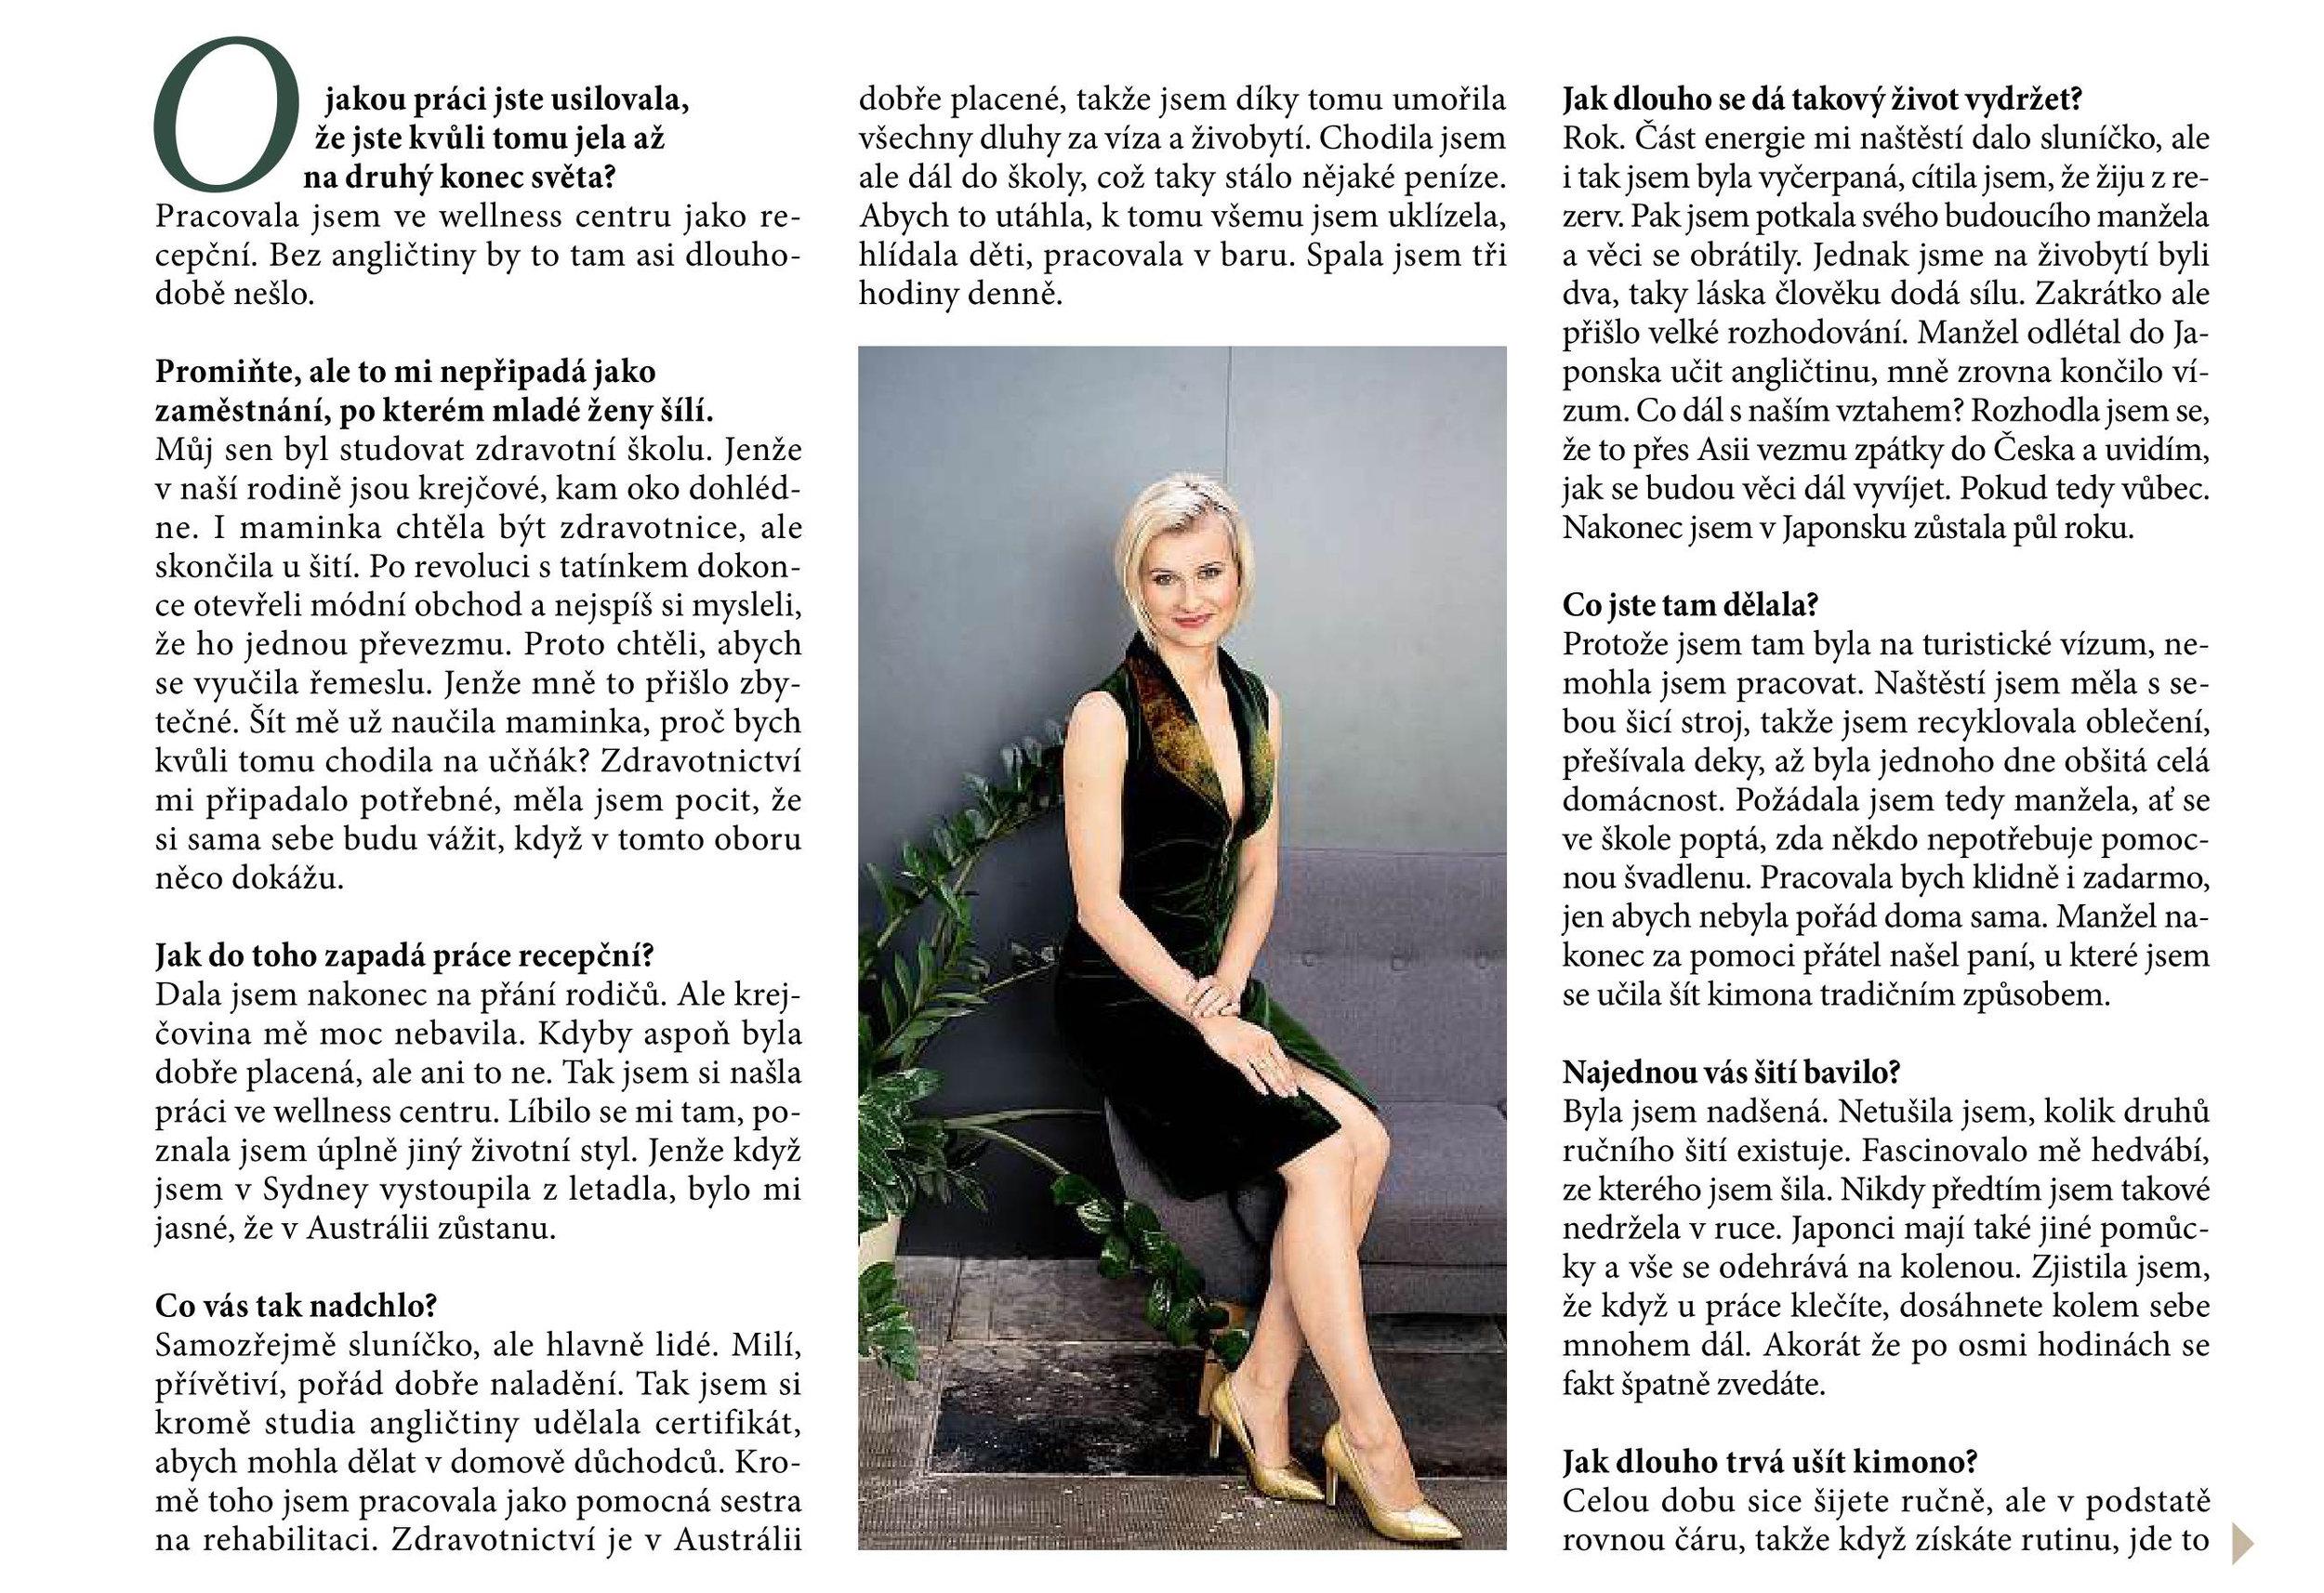 Iva Pfeiffer Ona Dnes Magazine Article.jpg